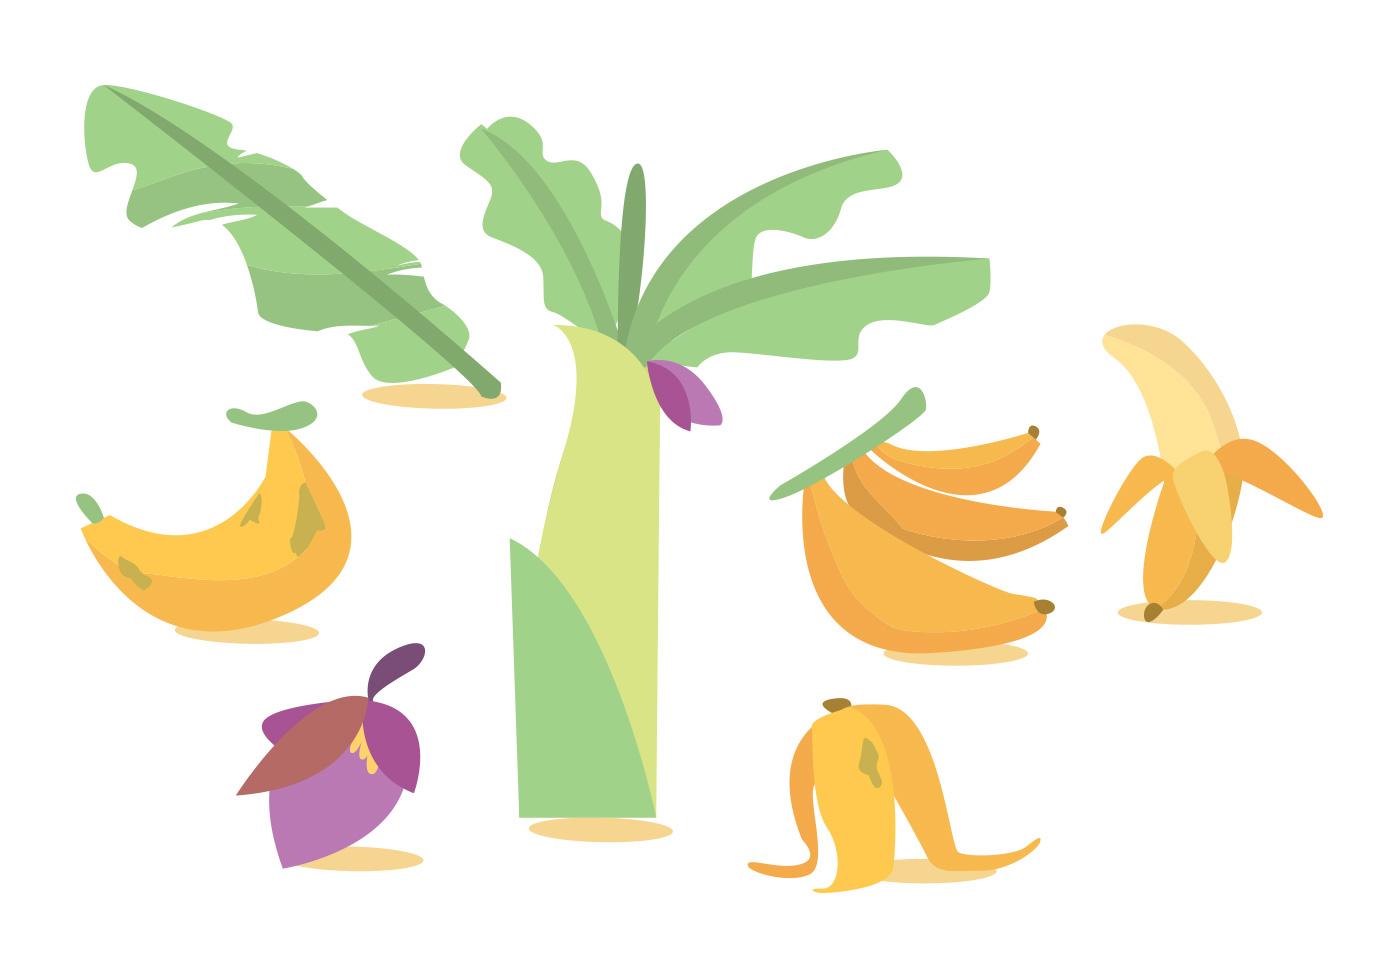 banana tree leaves vector - photo #14